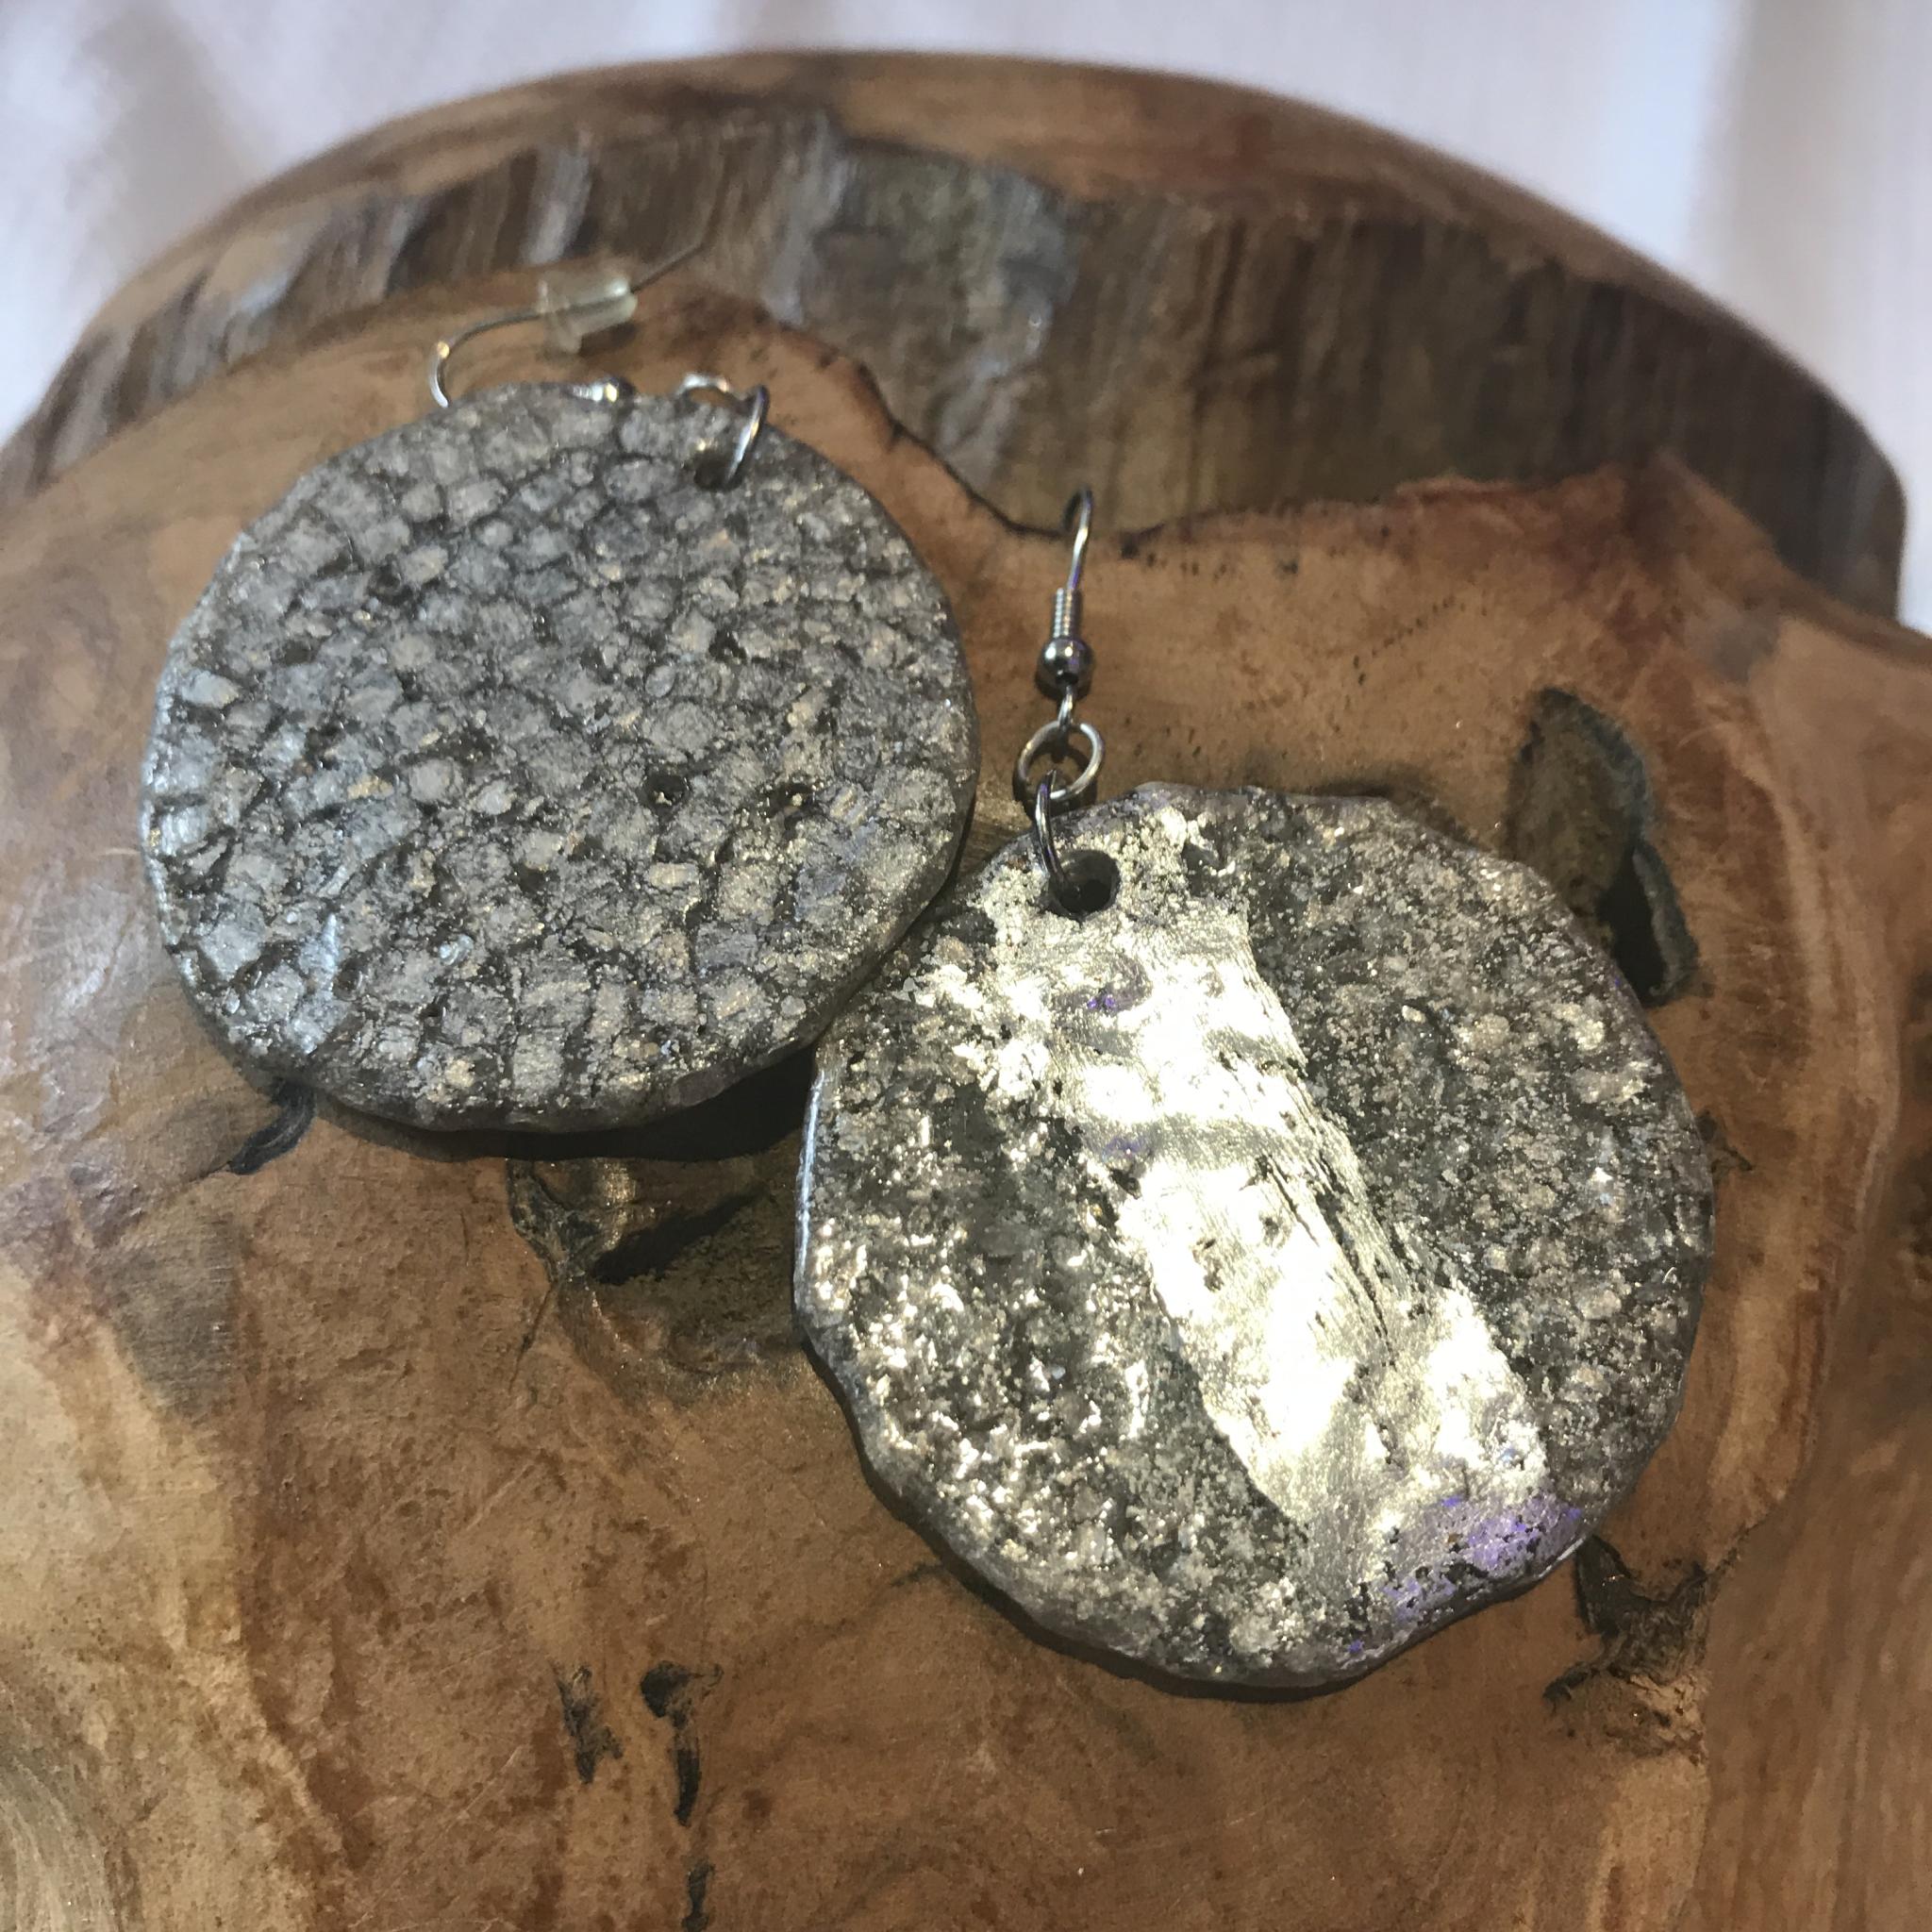 Ohrhänger silber mit Blattmetall - Rückseite silber granuliert - beidseitig tragbar